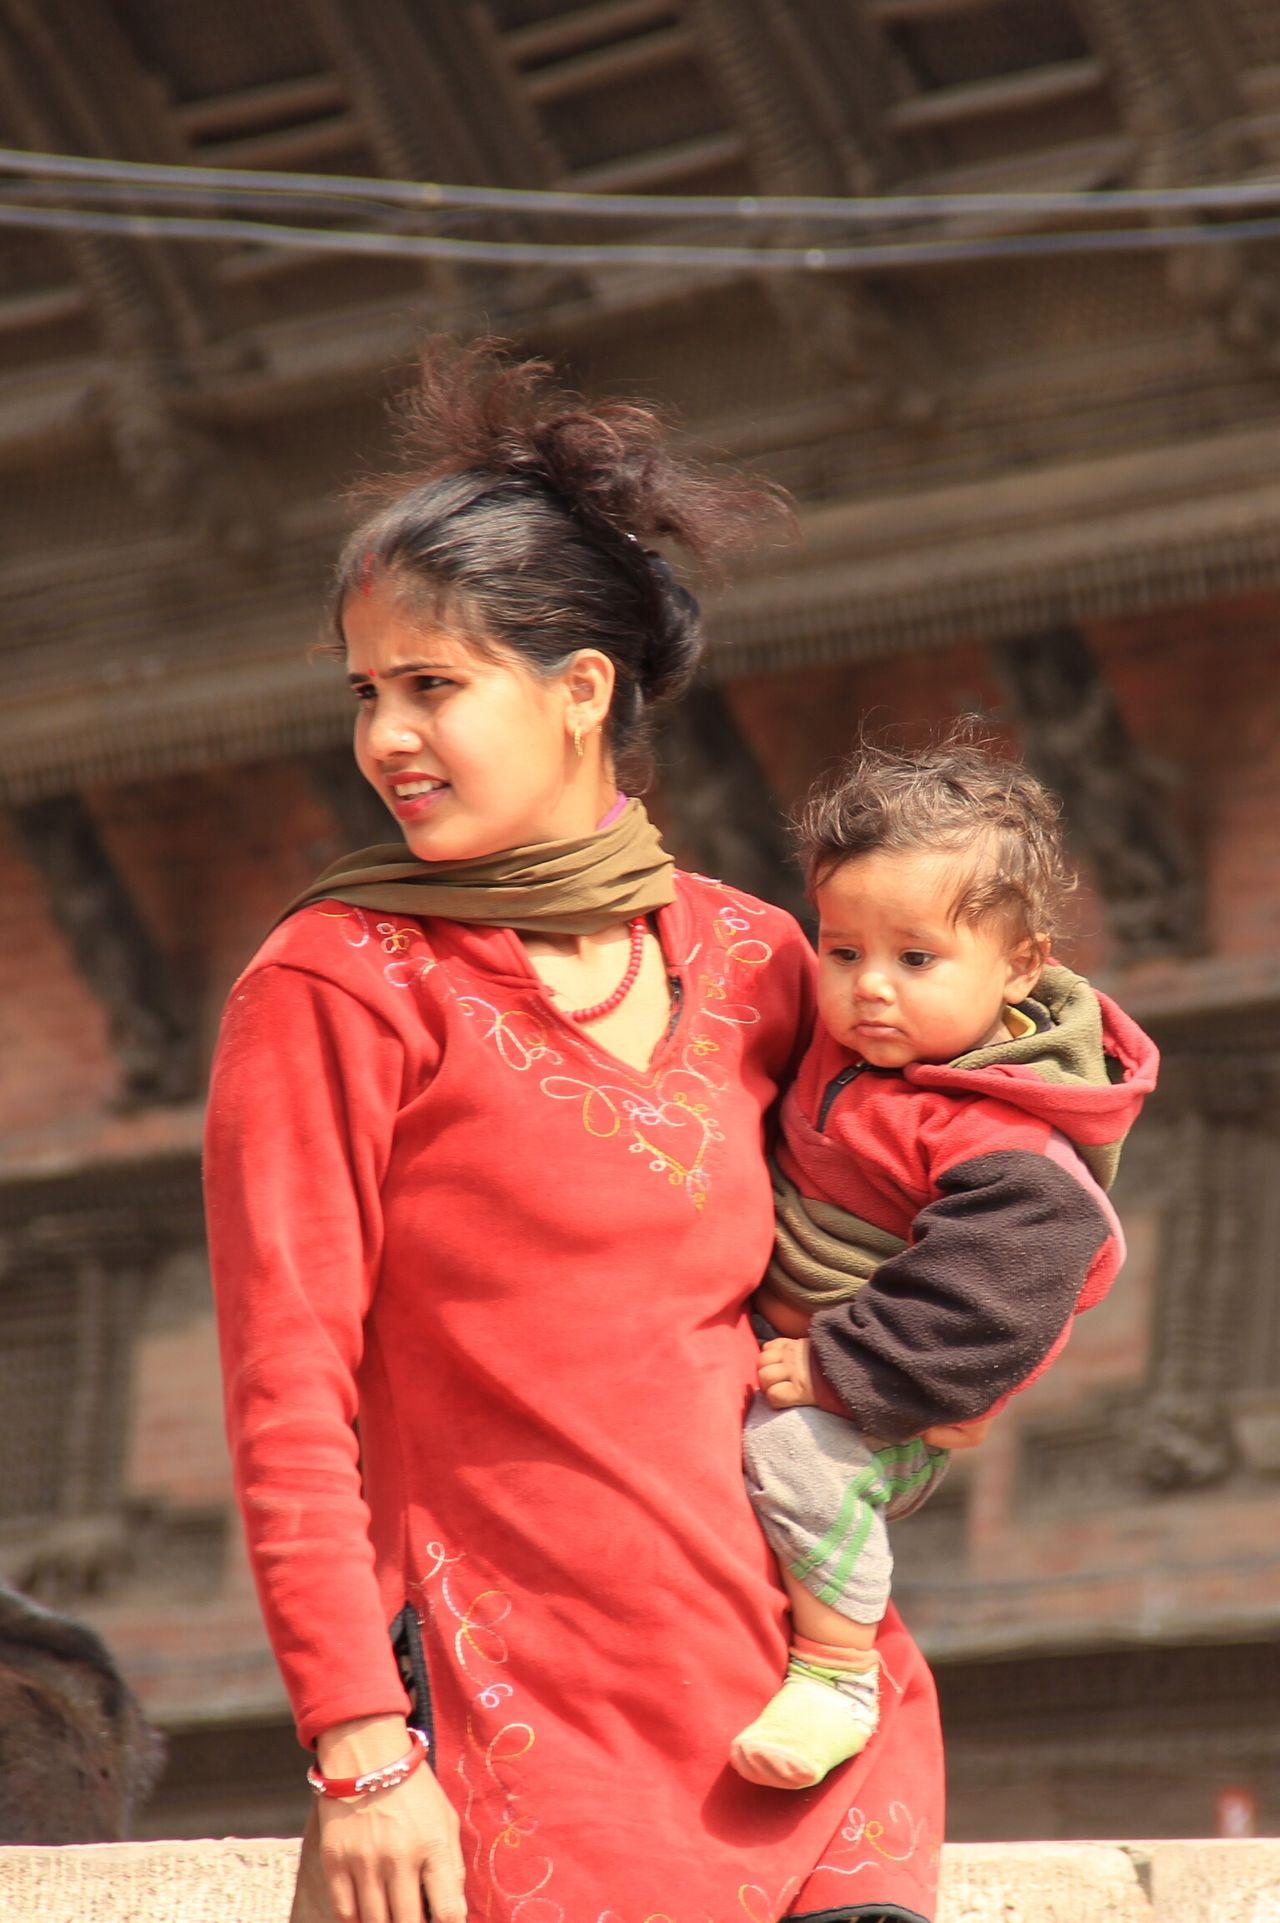 Mother And Child Beautiful Woman Traditional Clothing Nepalipeople😊 nepal travel Women Around The World